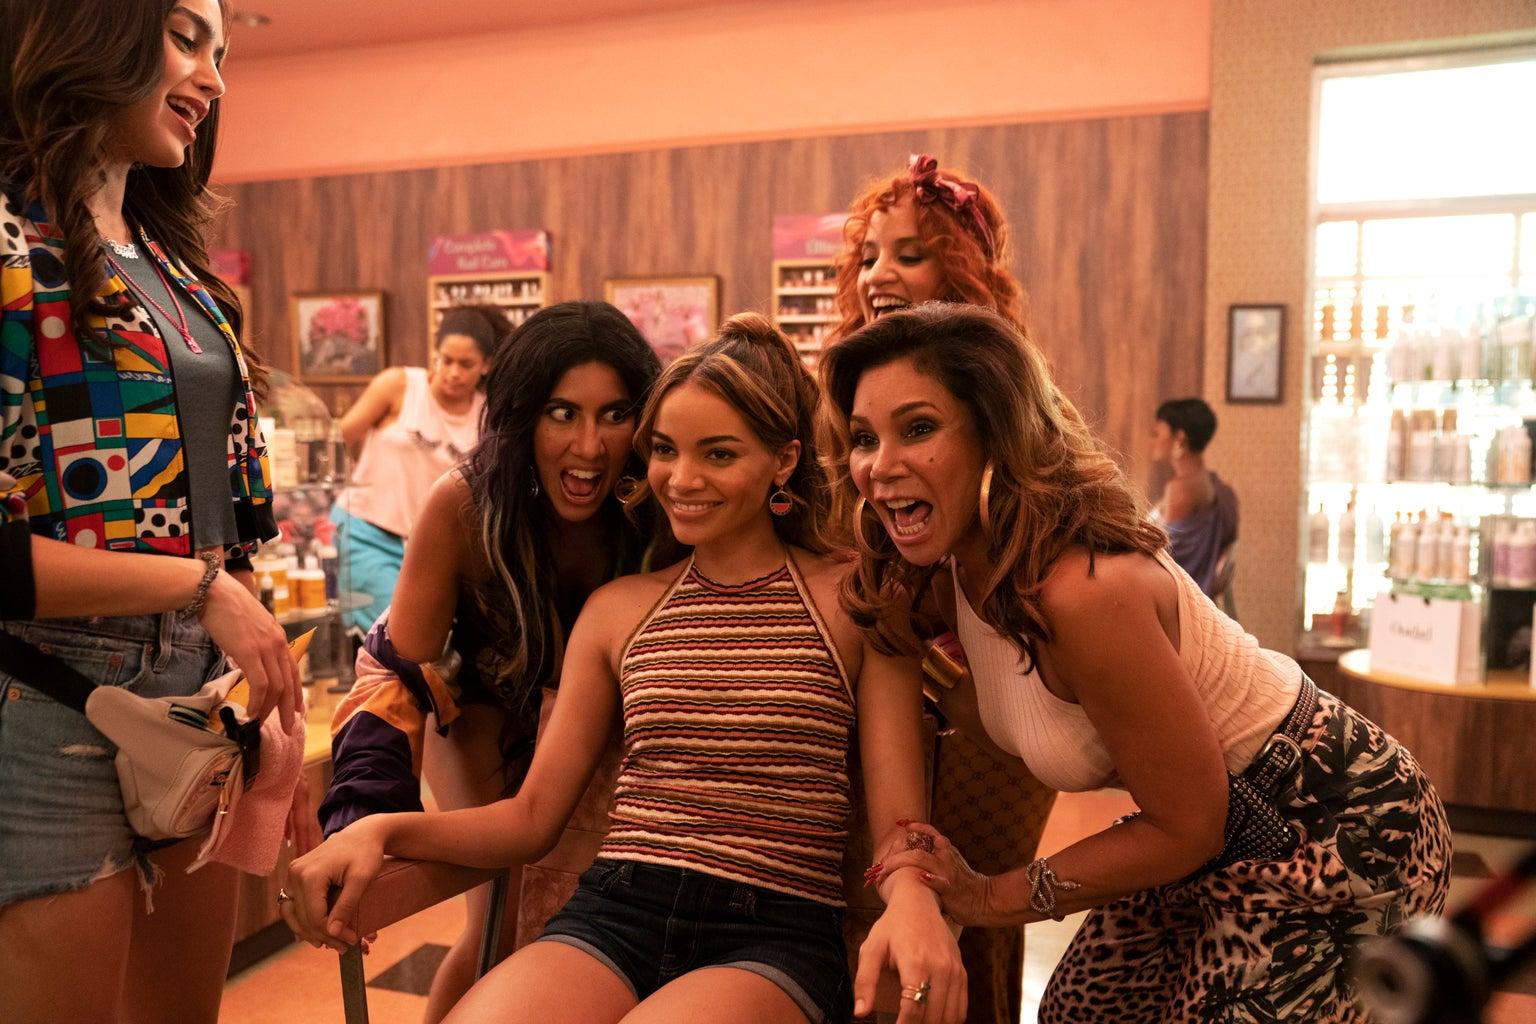 In the Heights Picture Seven: Melissa Barrera, Stephanie Beatriz, Dascha Polanco, Leslie Grace + Daphne Rubin-Vega